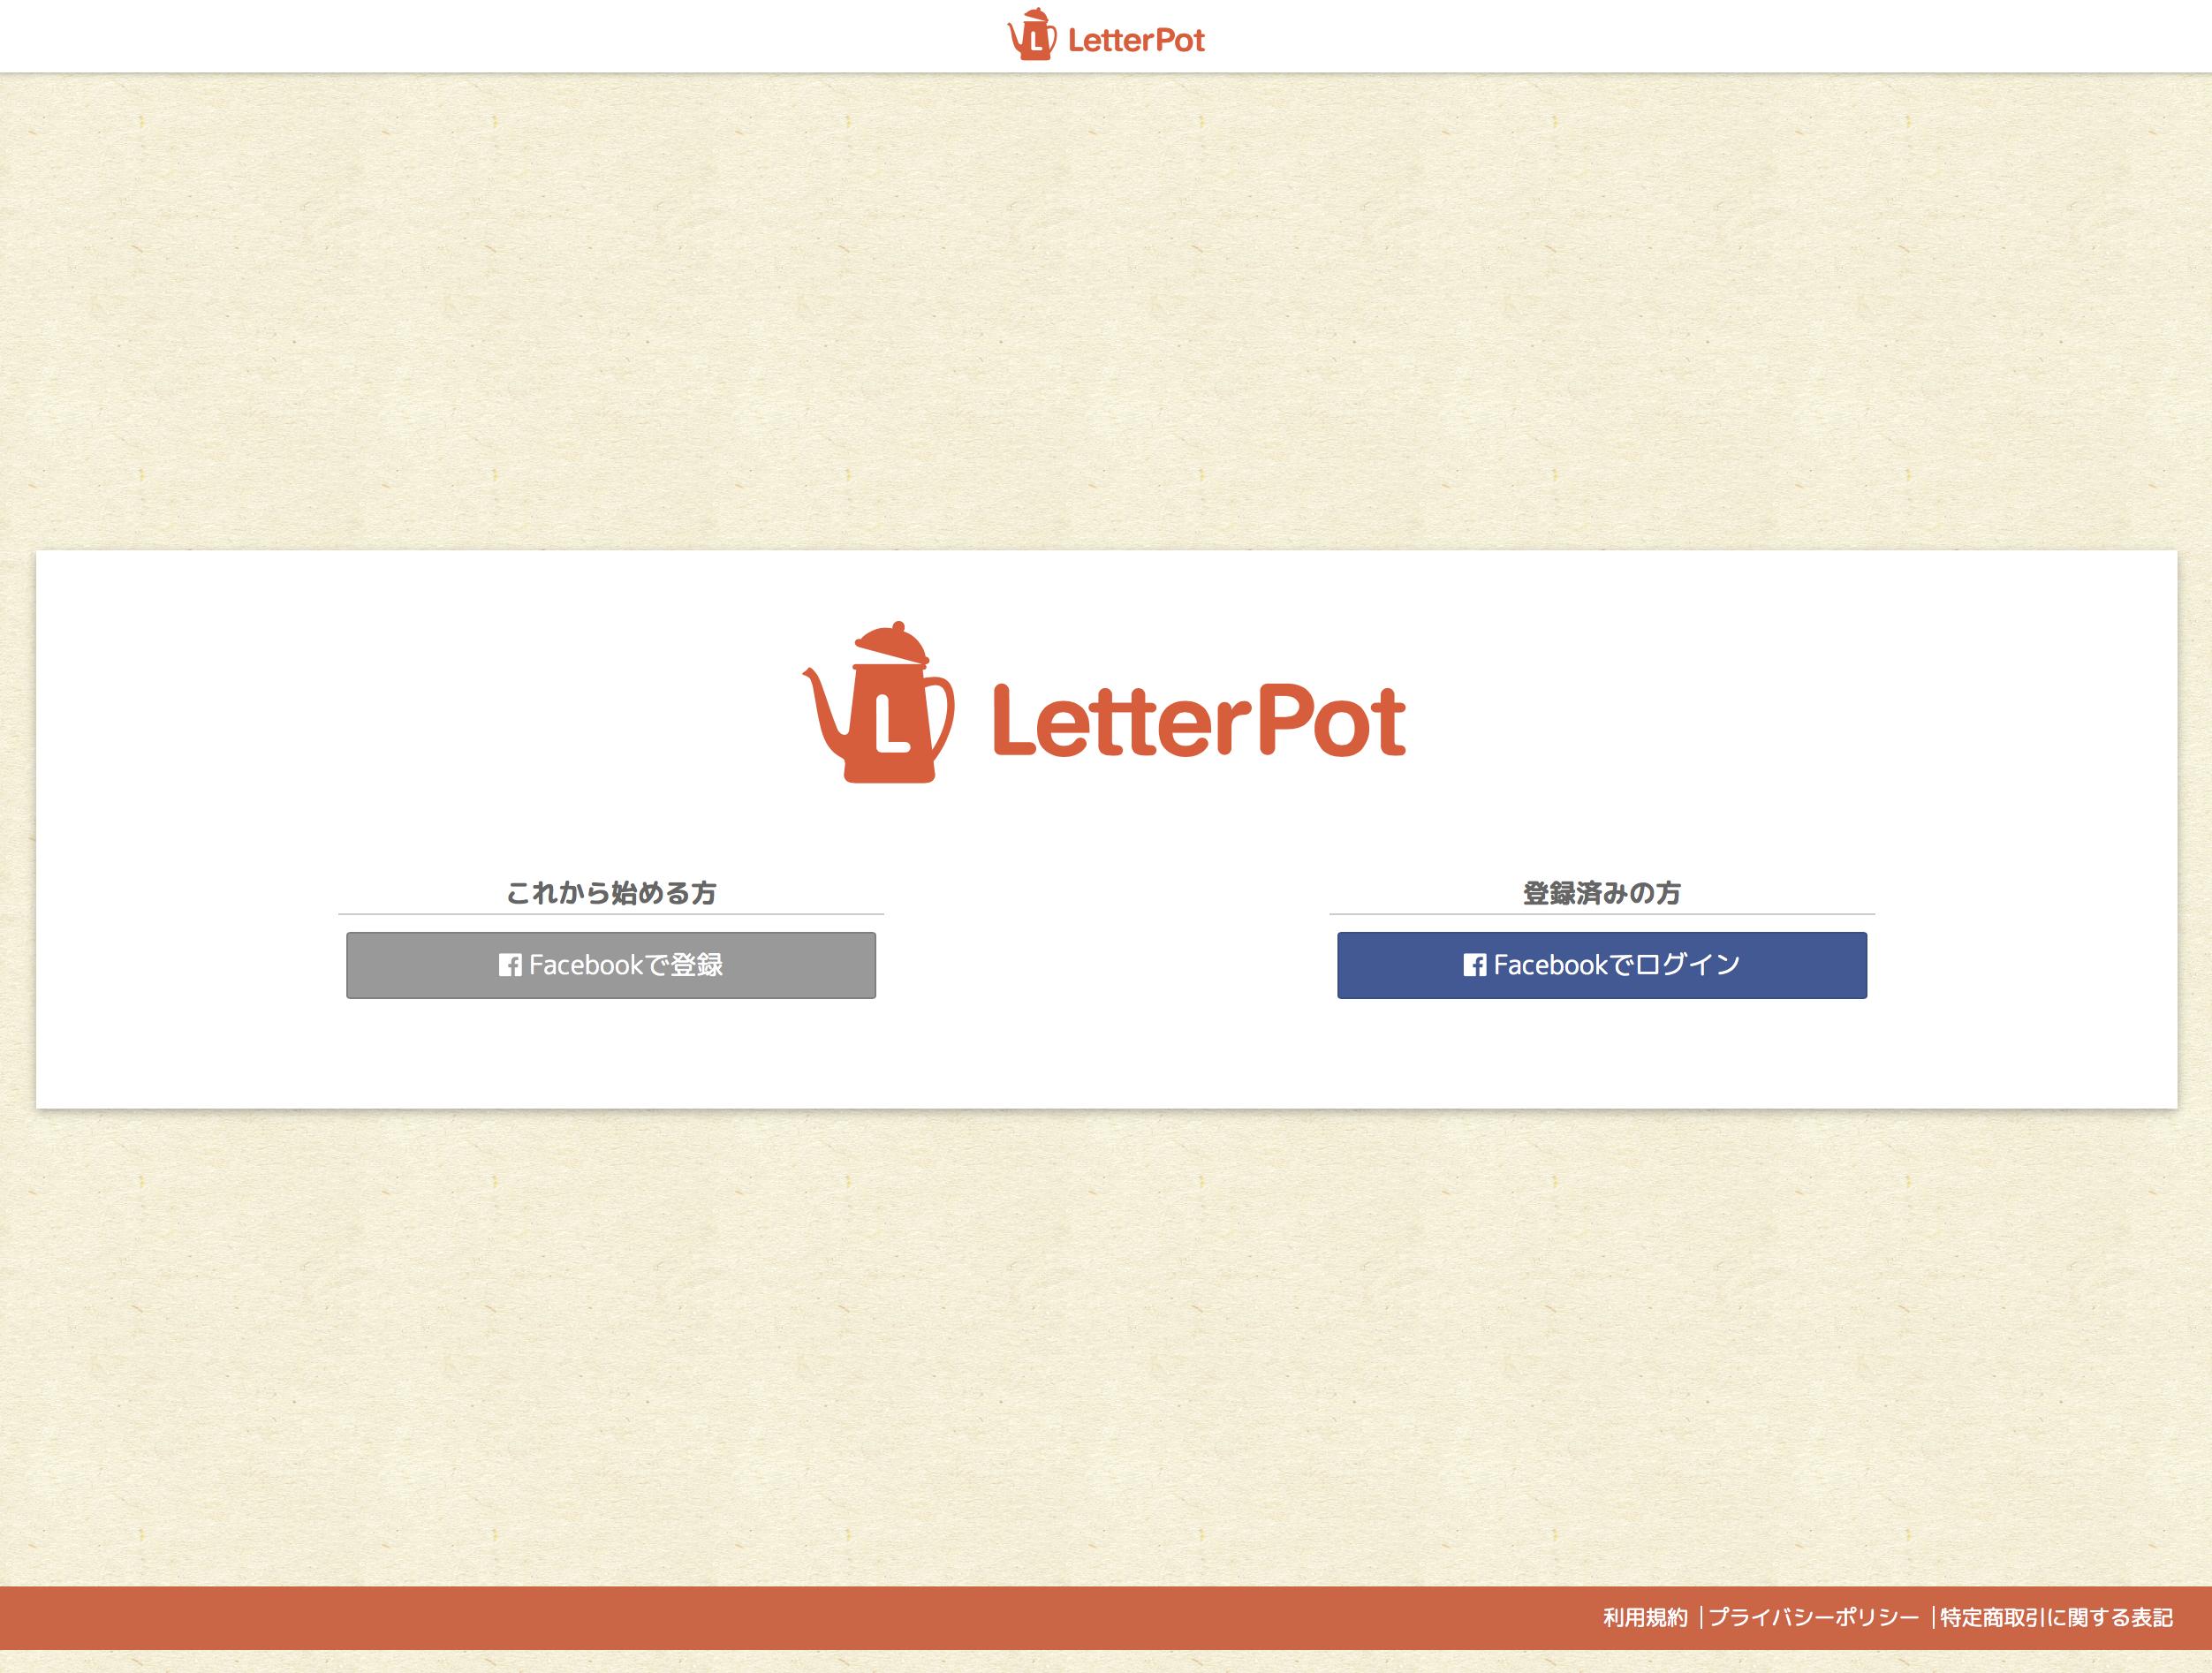 LetterPot公式サイト